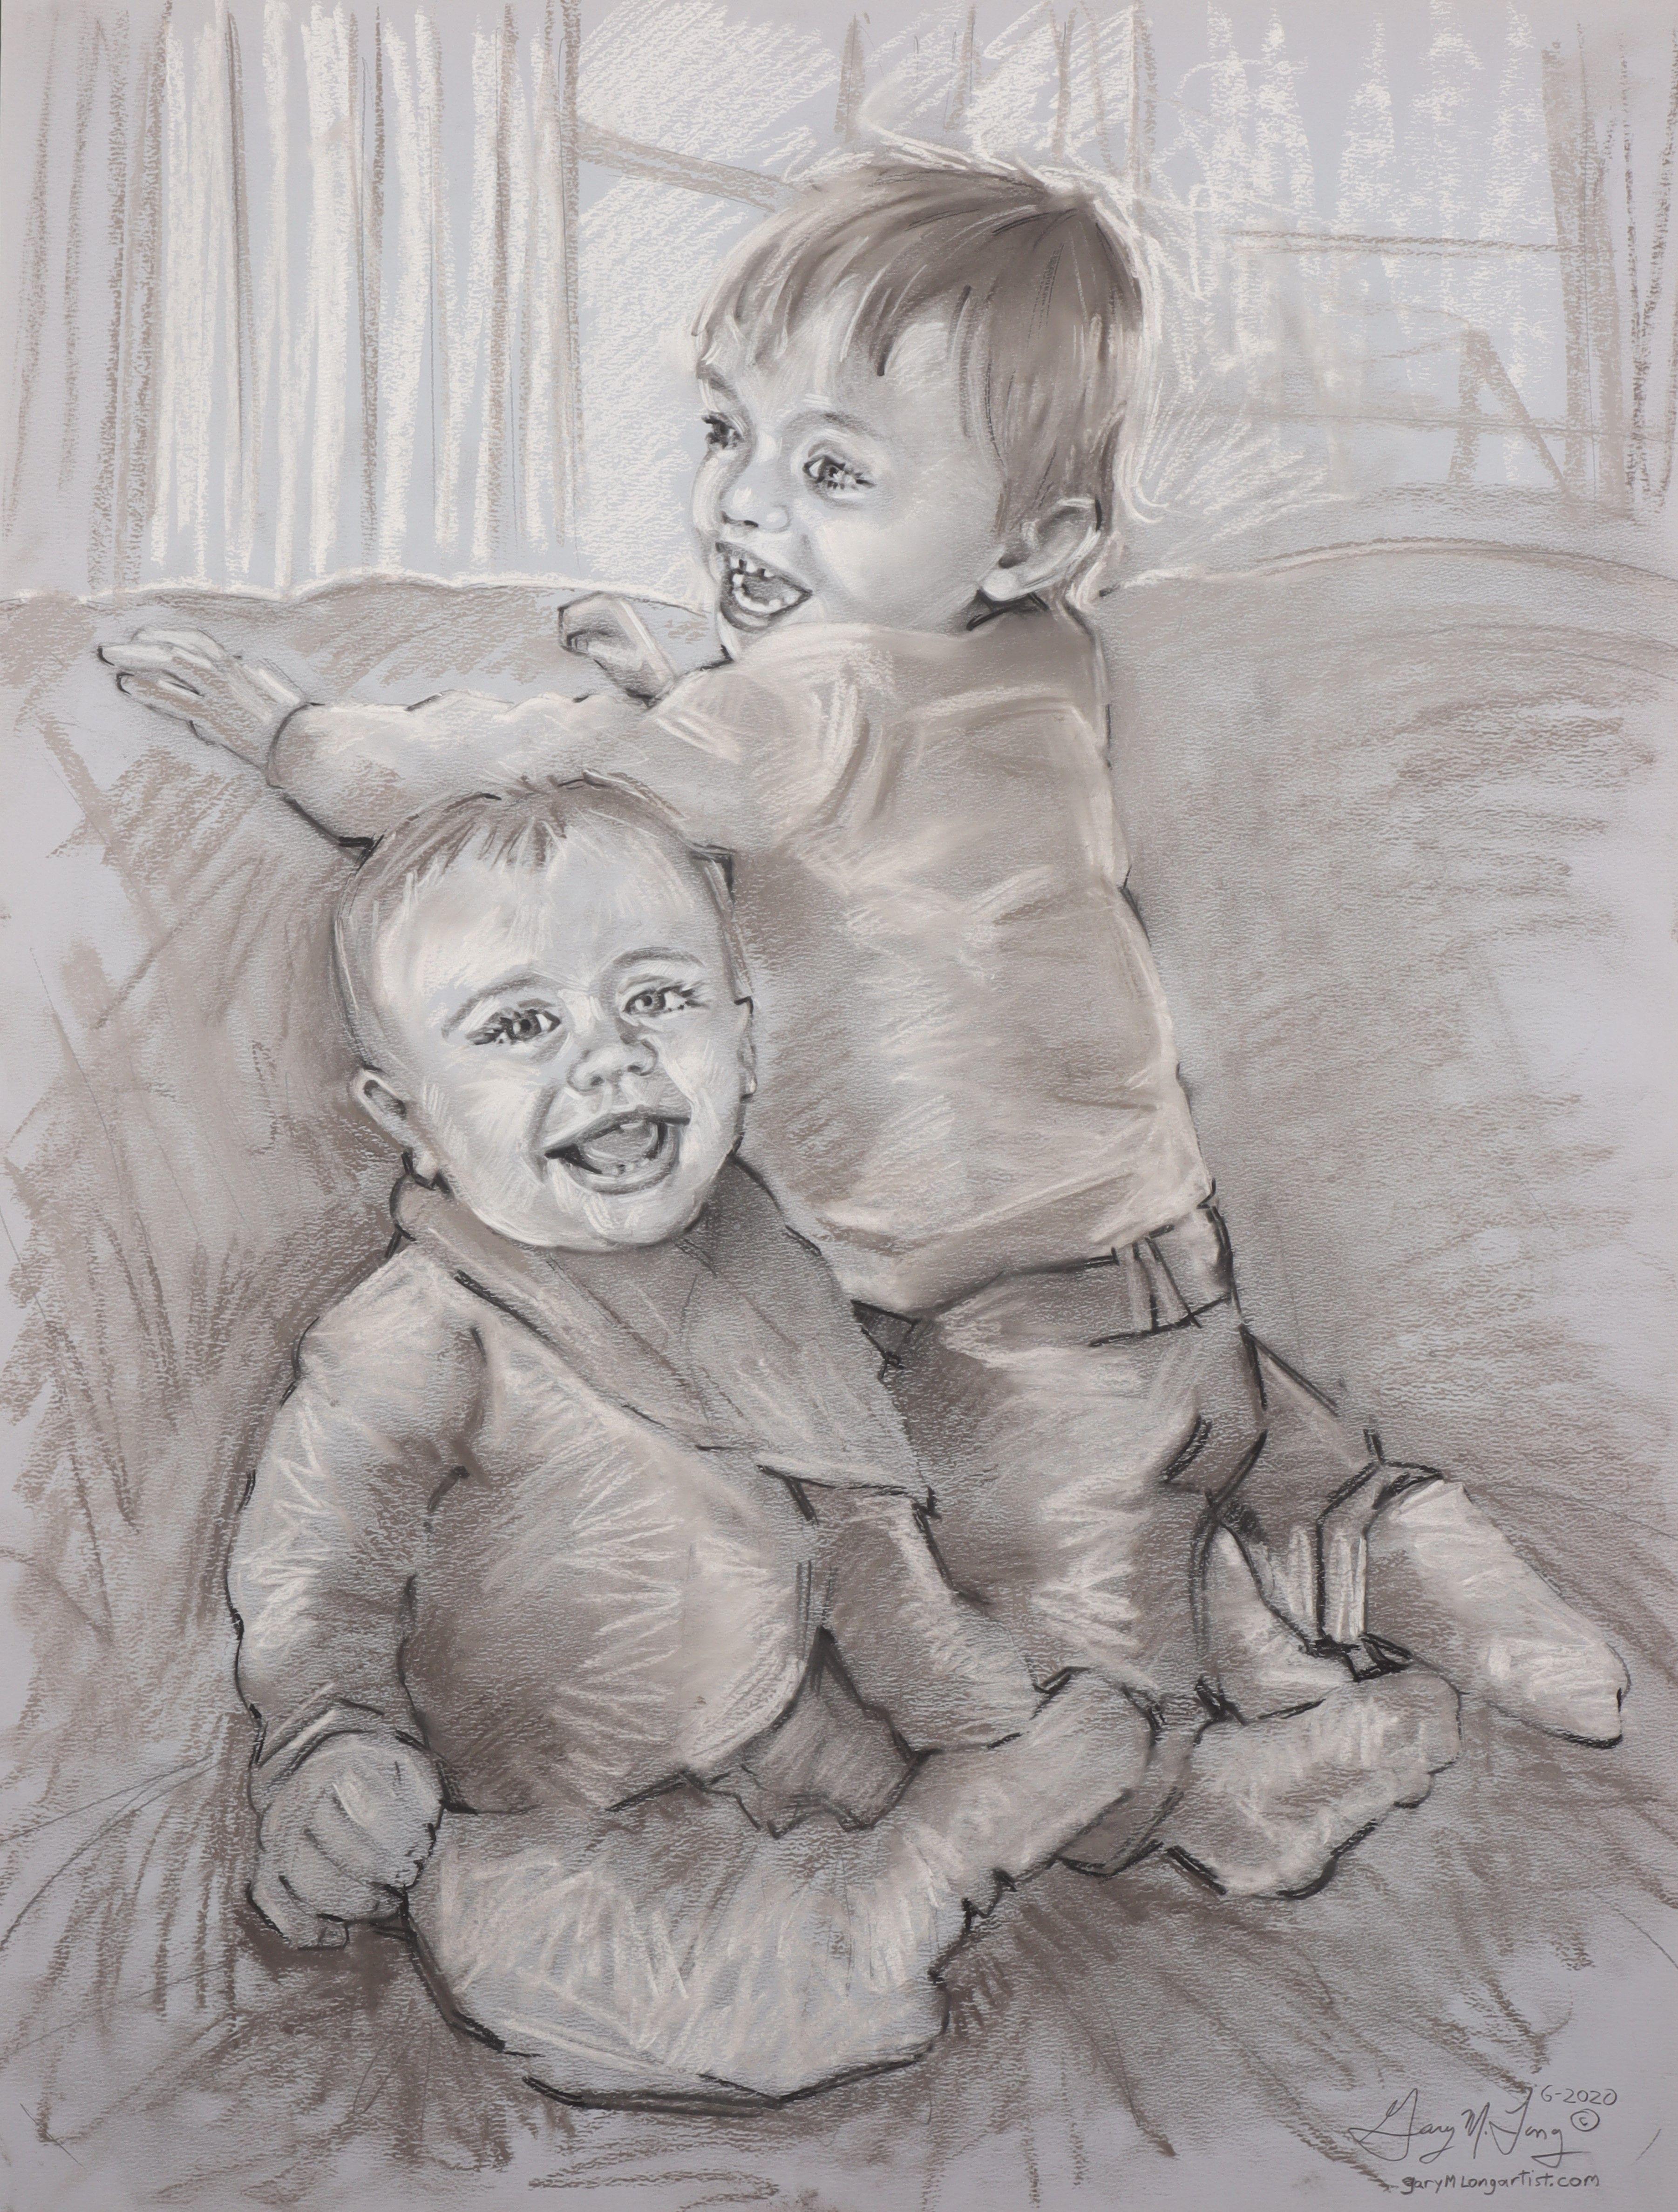 Artist: Gary Long, Pastel on Paper